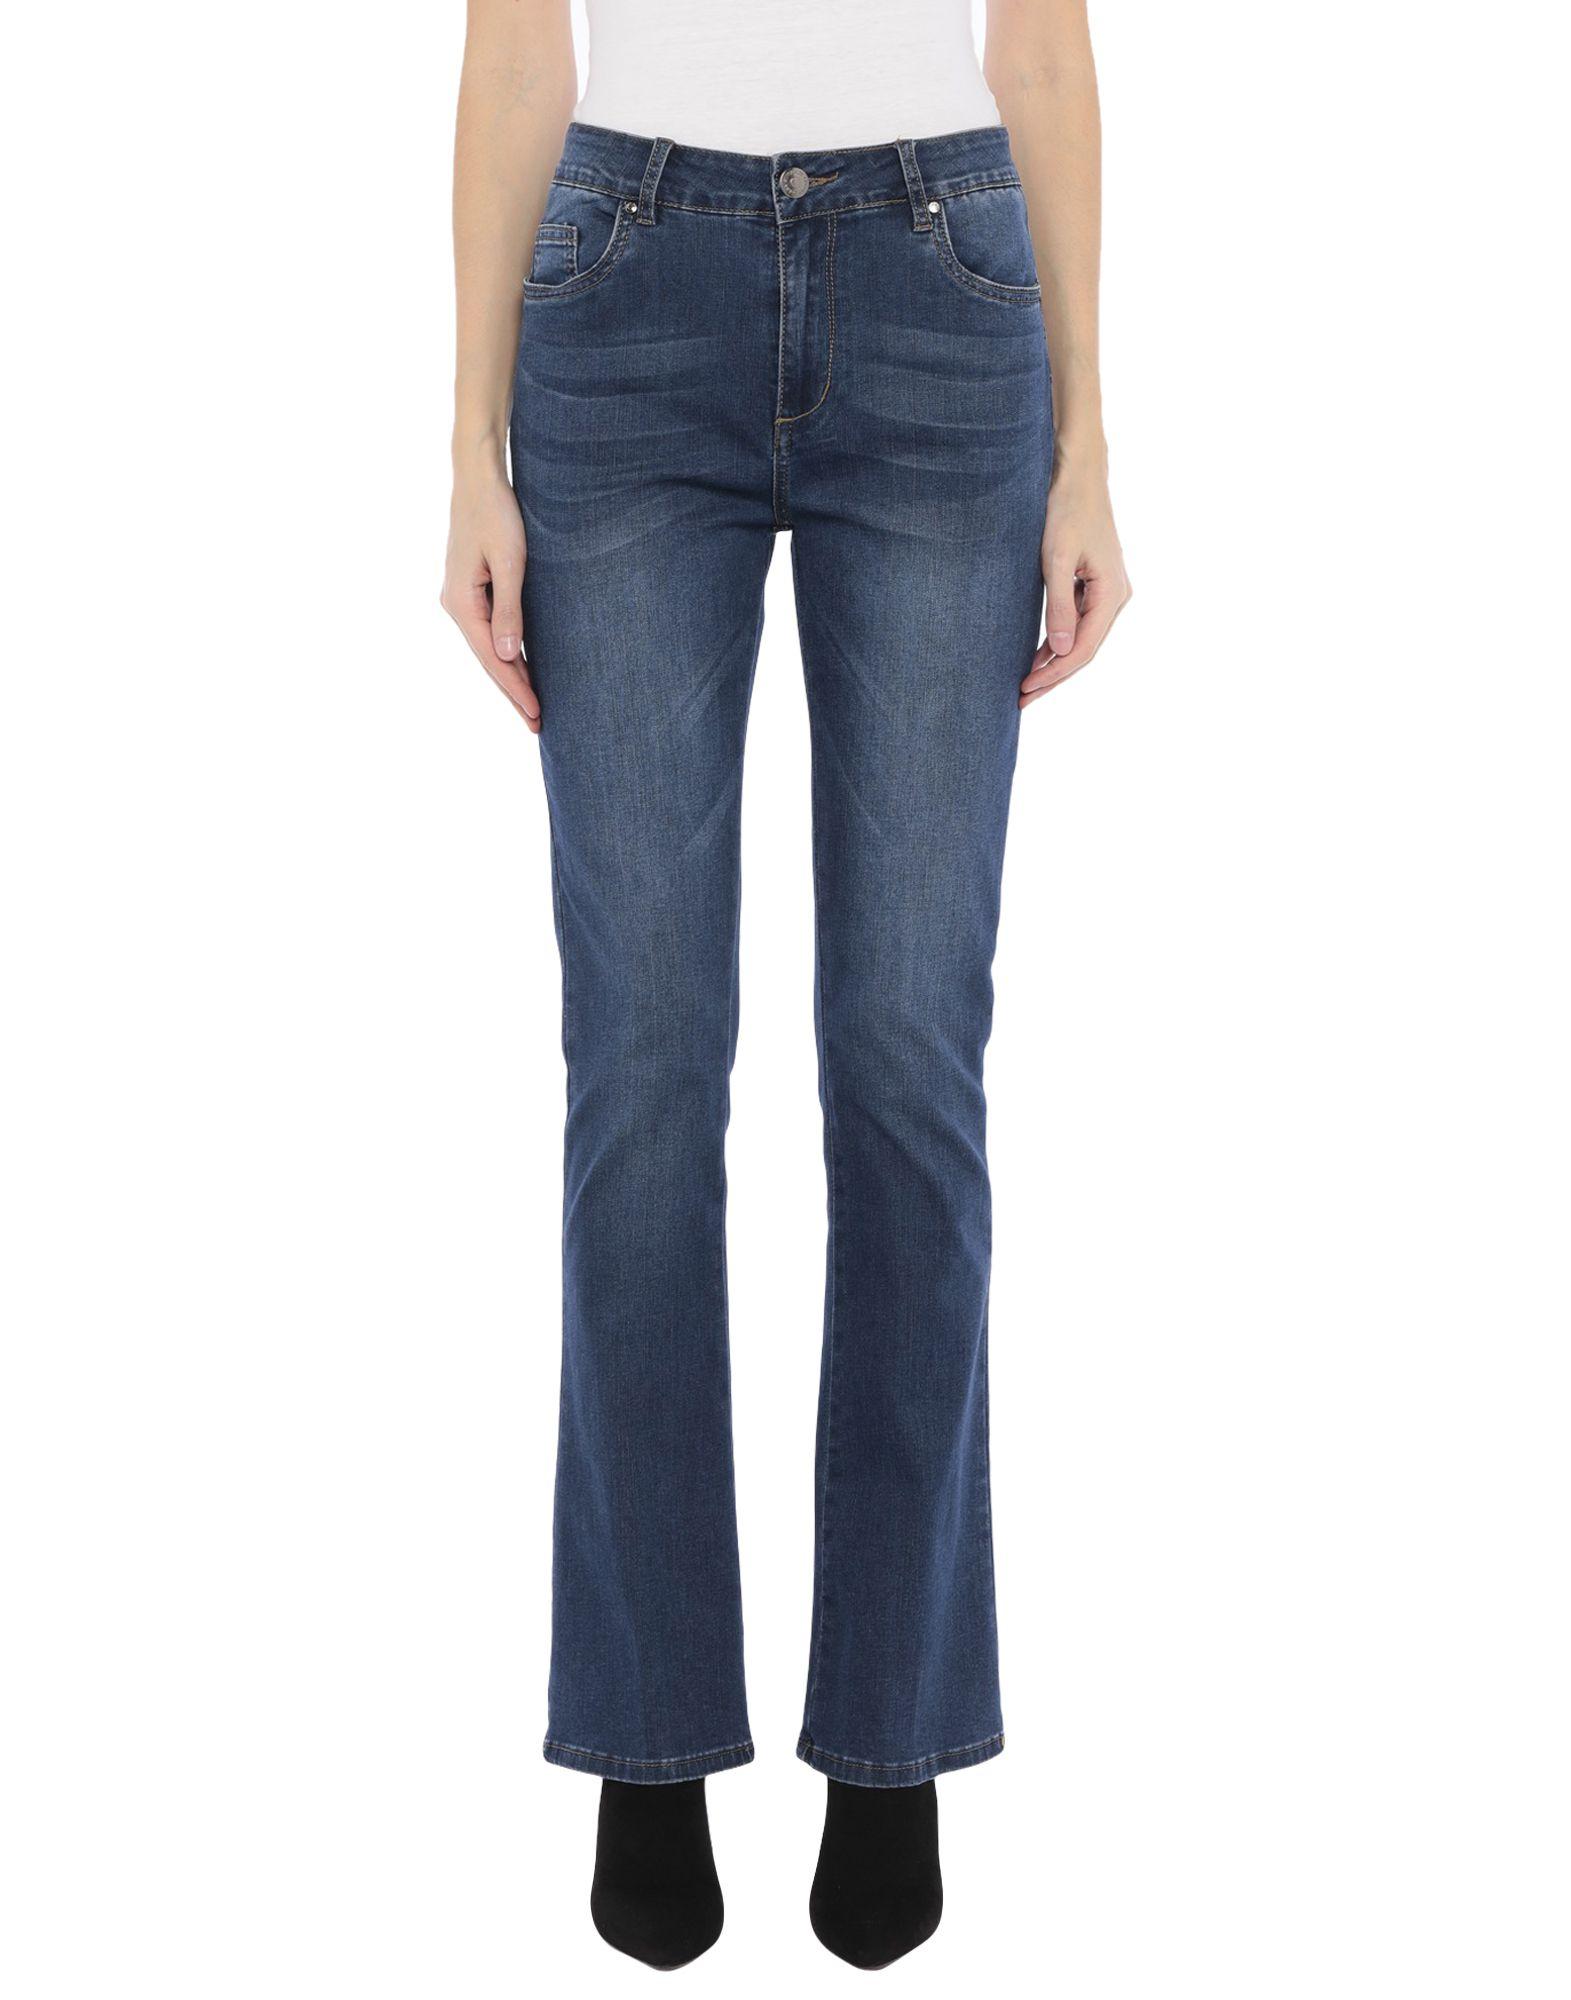 CHIARA DALBA Джинсовые брюки chiara deste джинсовые брюки page 5